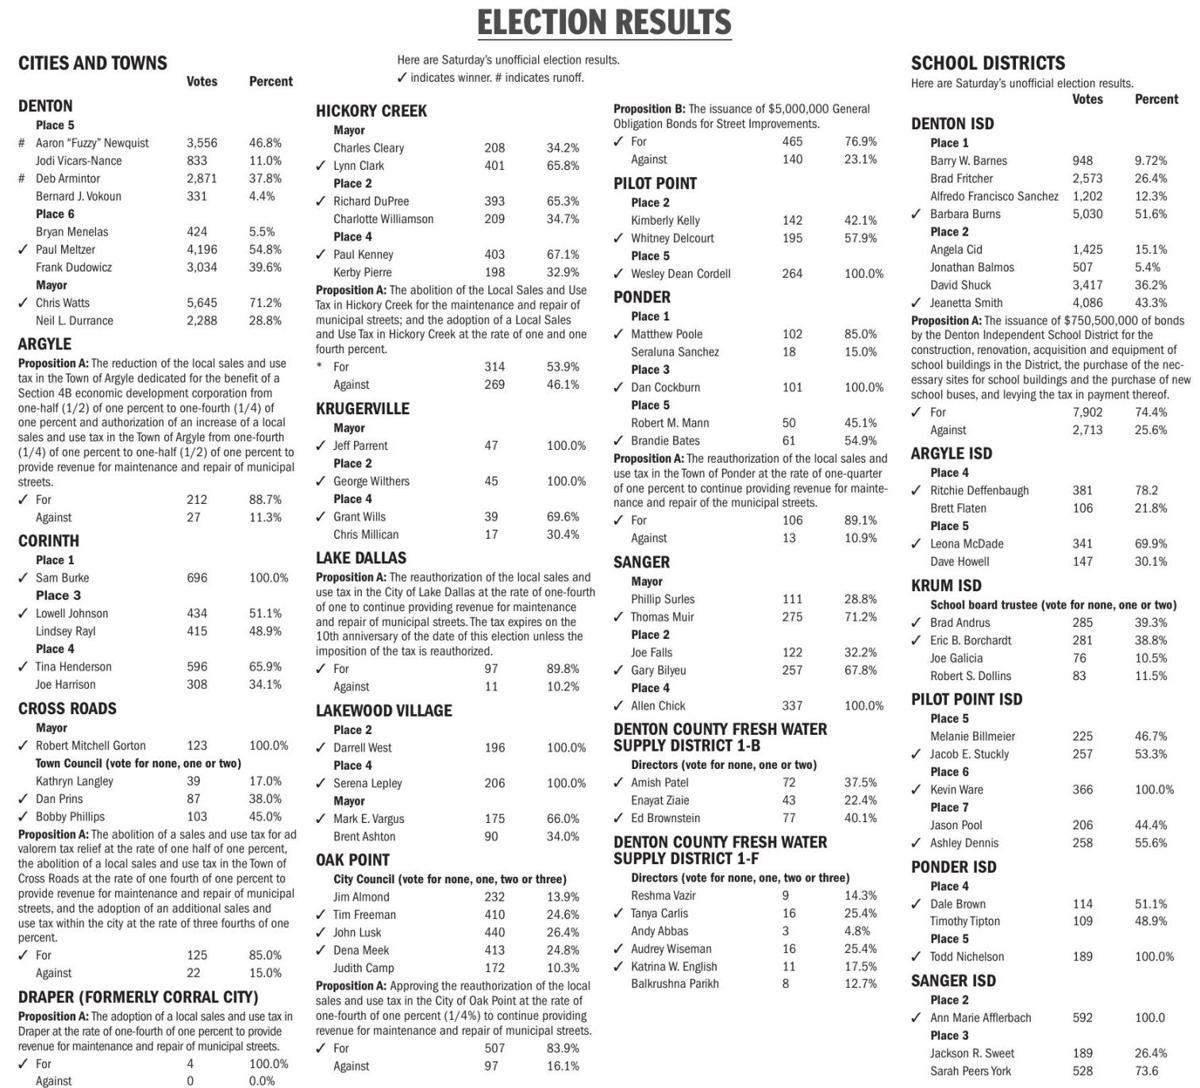 Denton-area Election Results